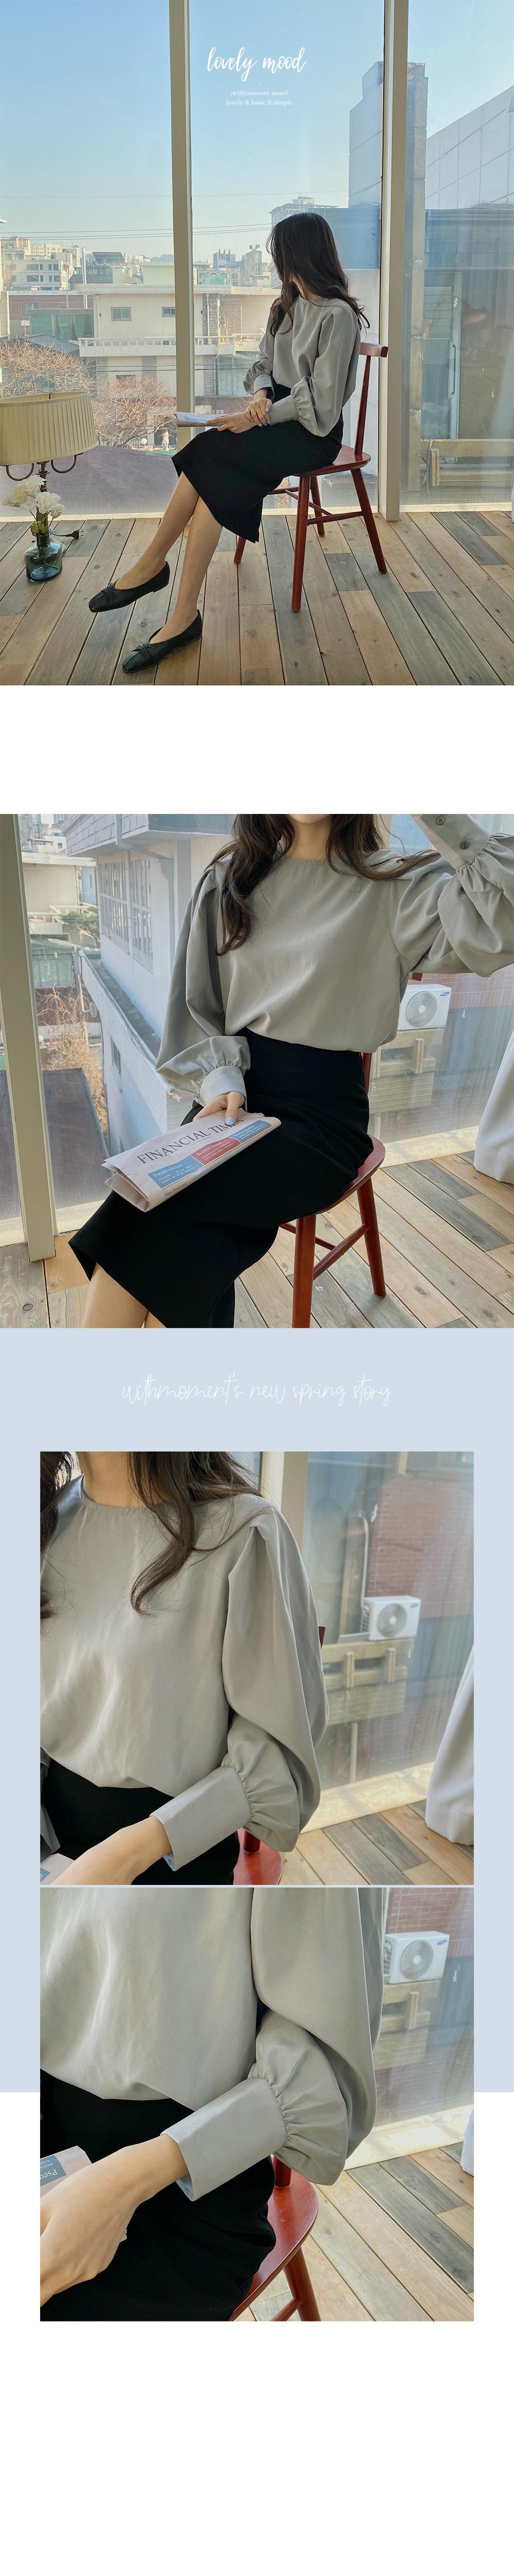 Most Skirt